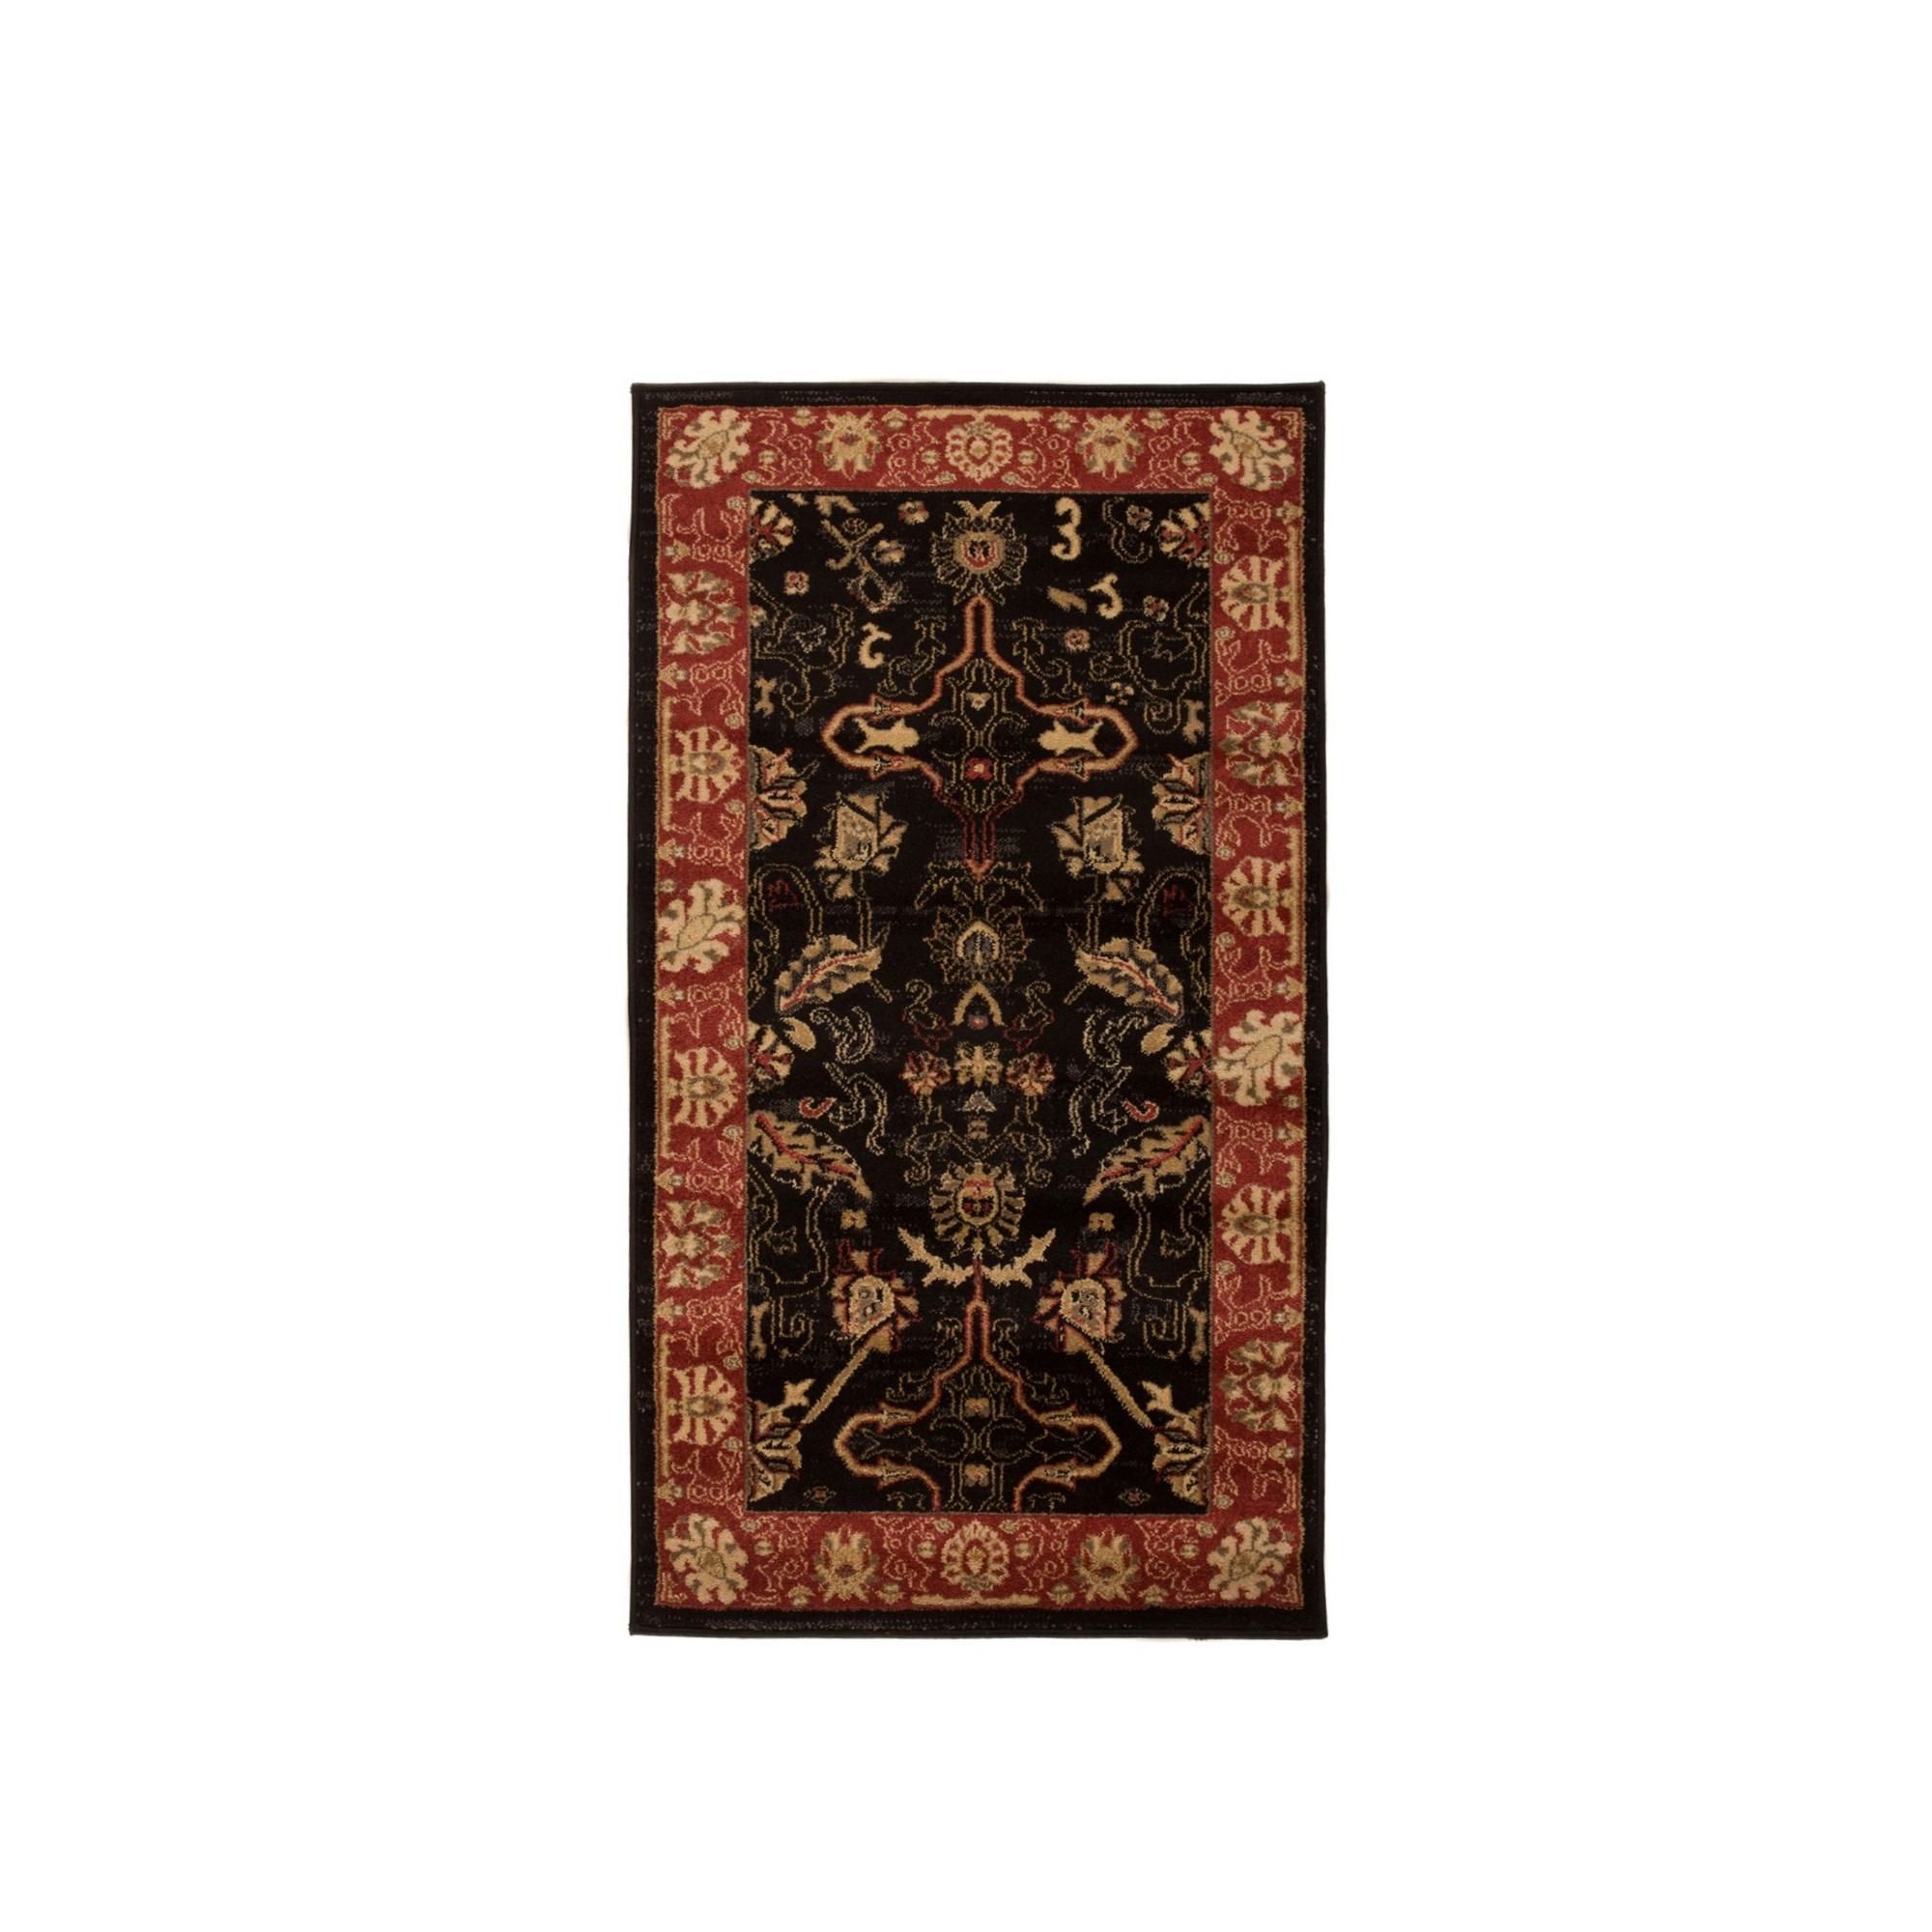 Flair-Rugs-Ziegler-Arak-Tapis-a-motif-traditionnel-FR253